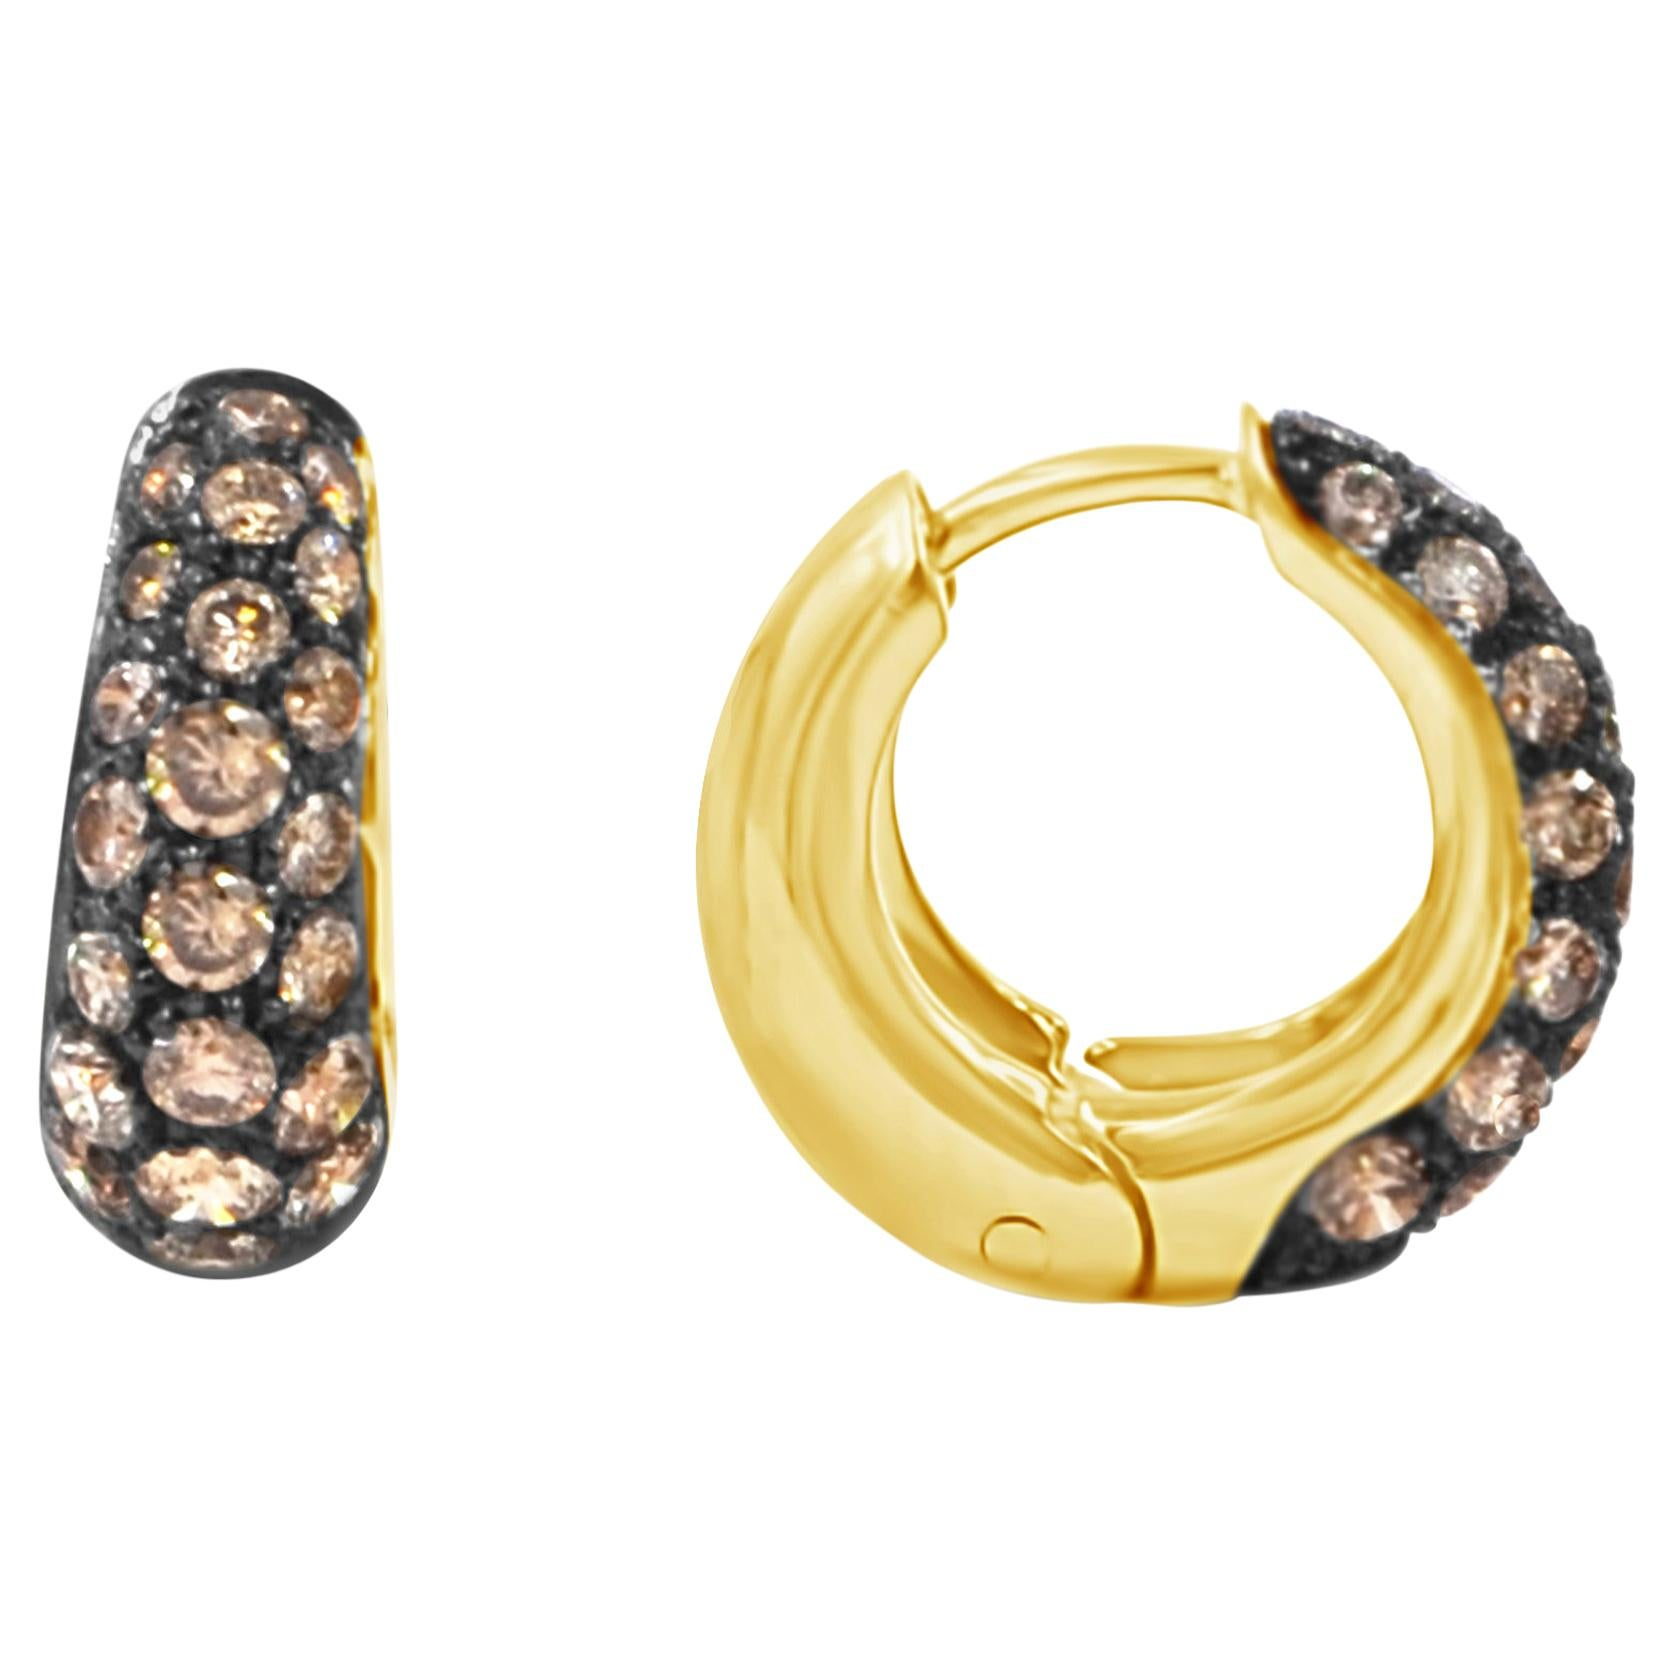 18 Karat Yellow Gold and Brown Diamonds Pavè Garavelli Huggie Earrings